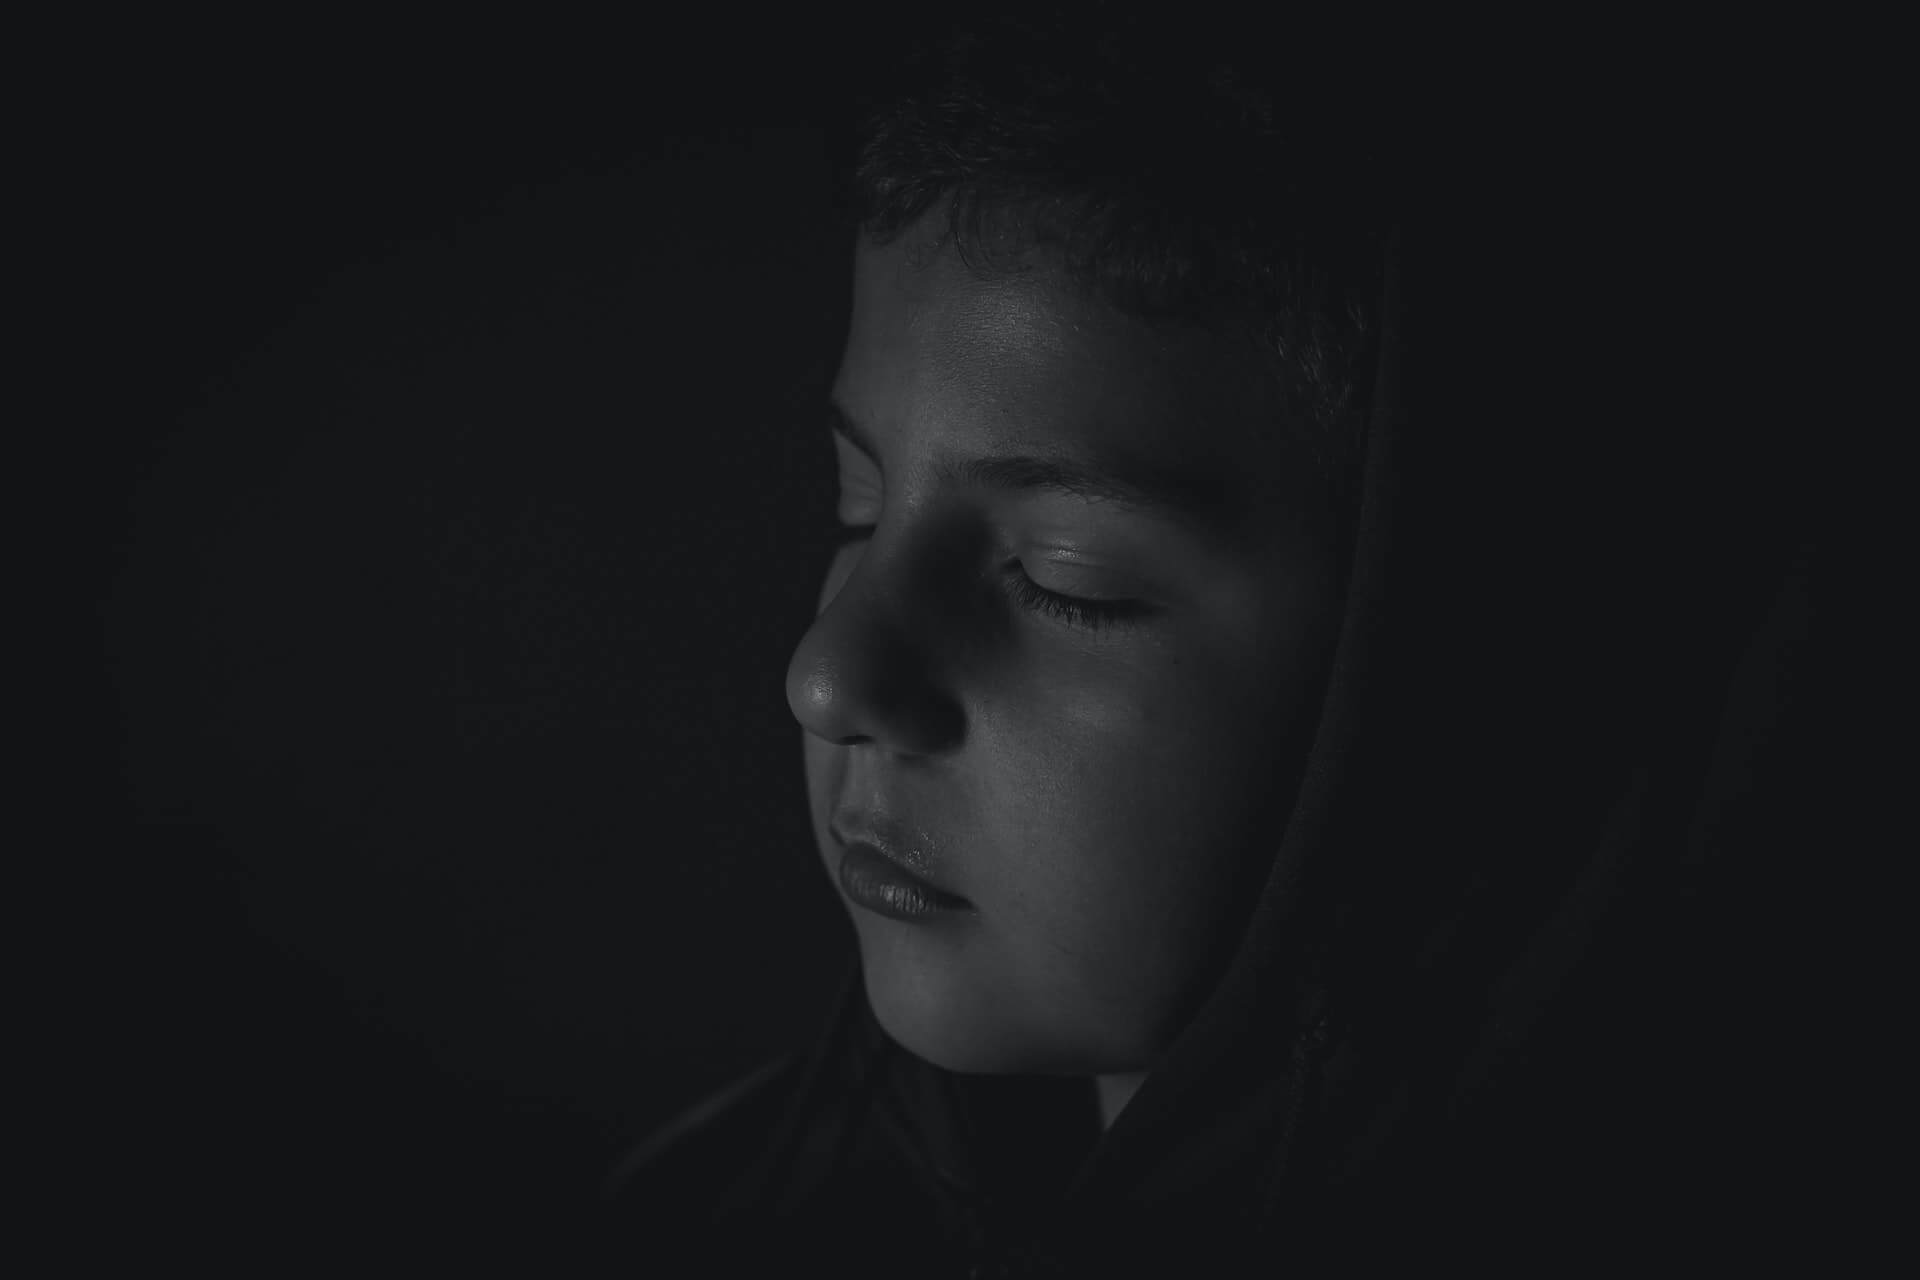 bebeklikten-yetiskinlige-depresyon